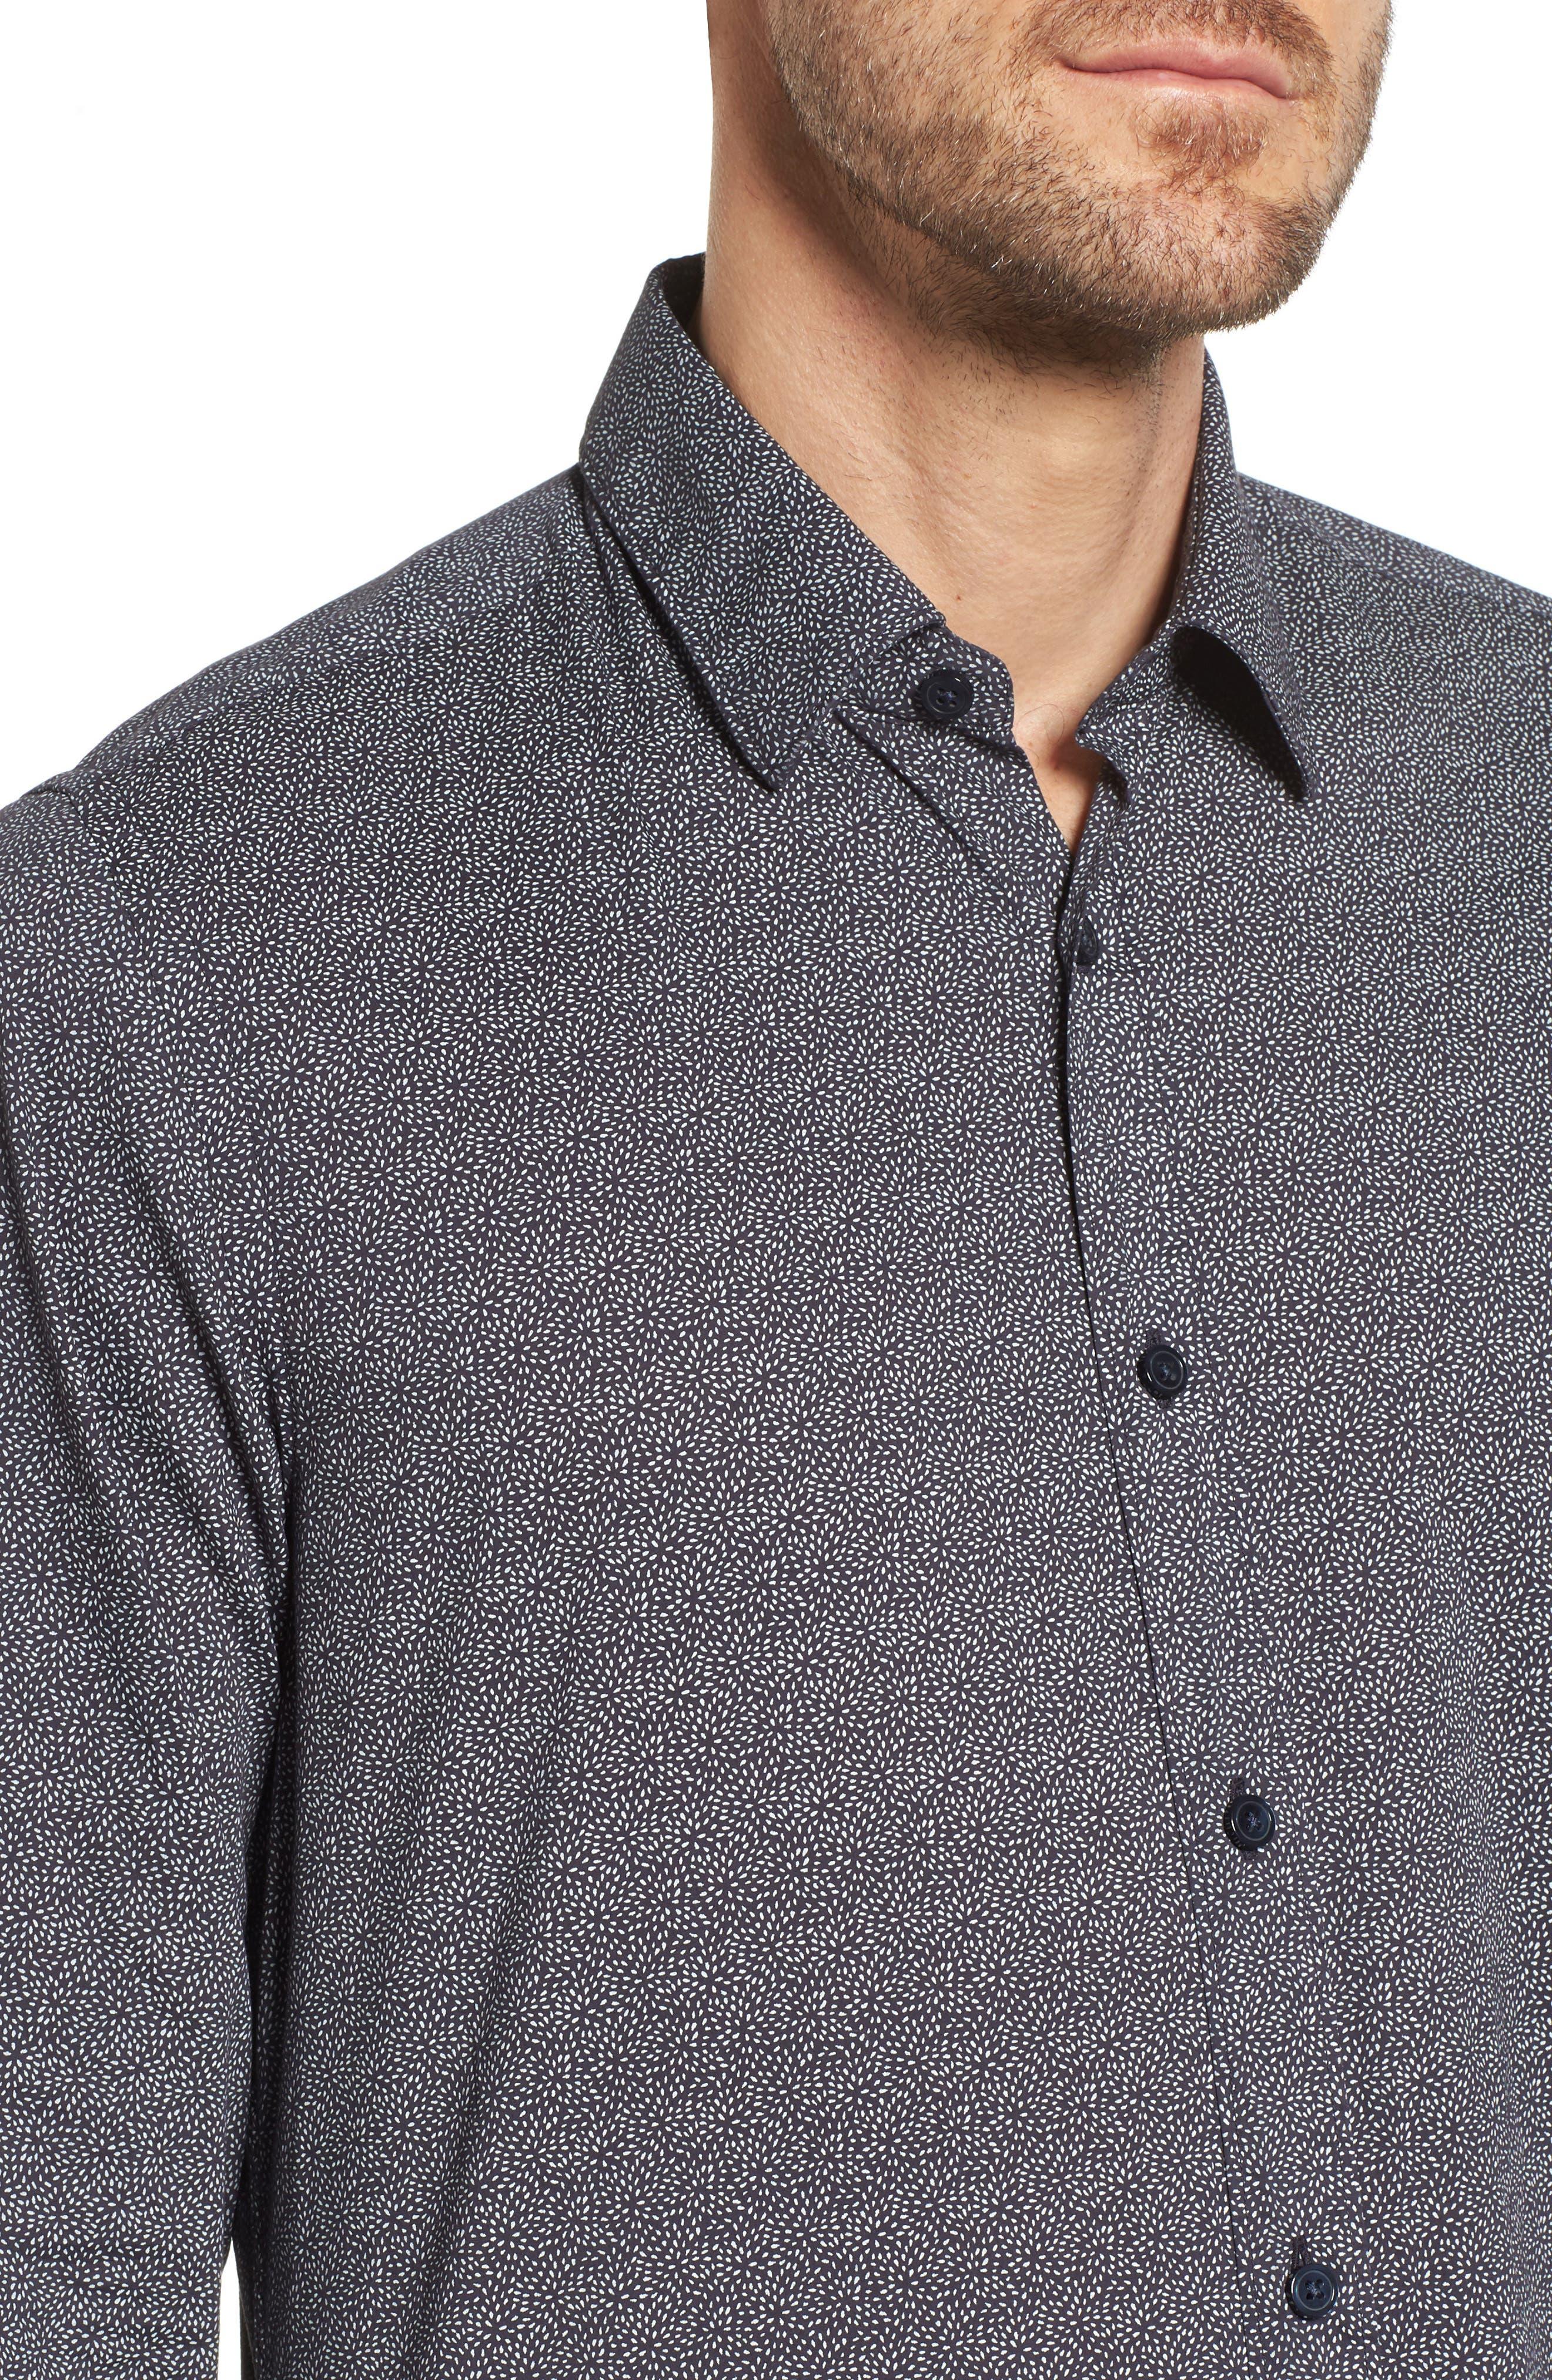 Lukas Regular Fit Print Sport Shirt,                             Alternate thumbnail 4, color,                             Blue